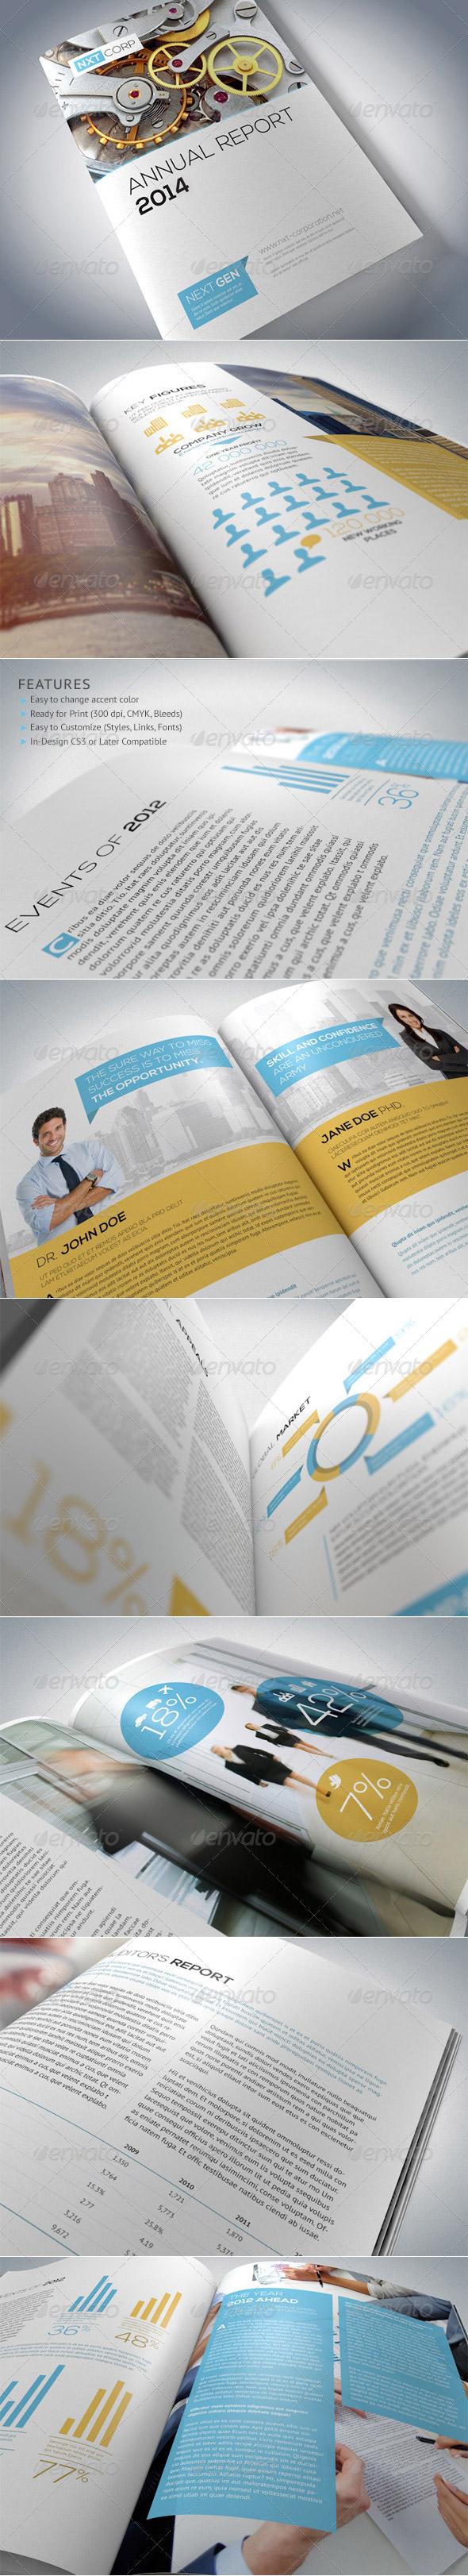 annual_report_2012_mockup-template-brochure